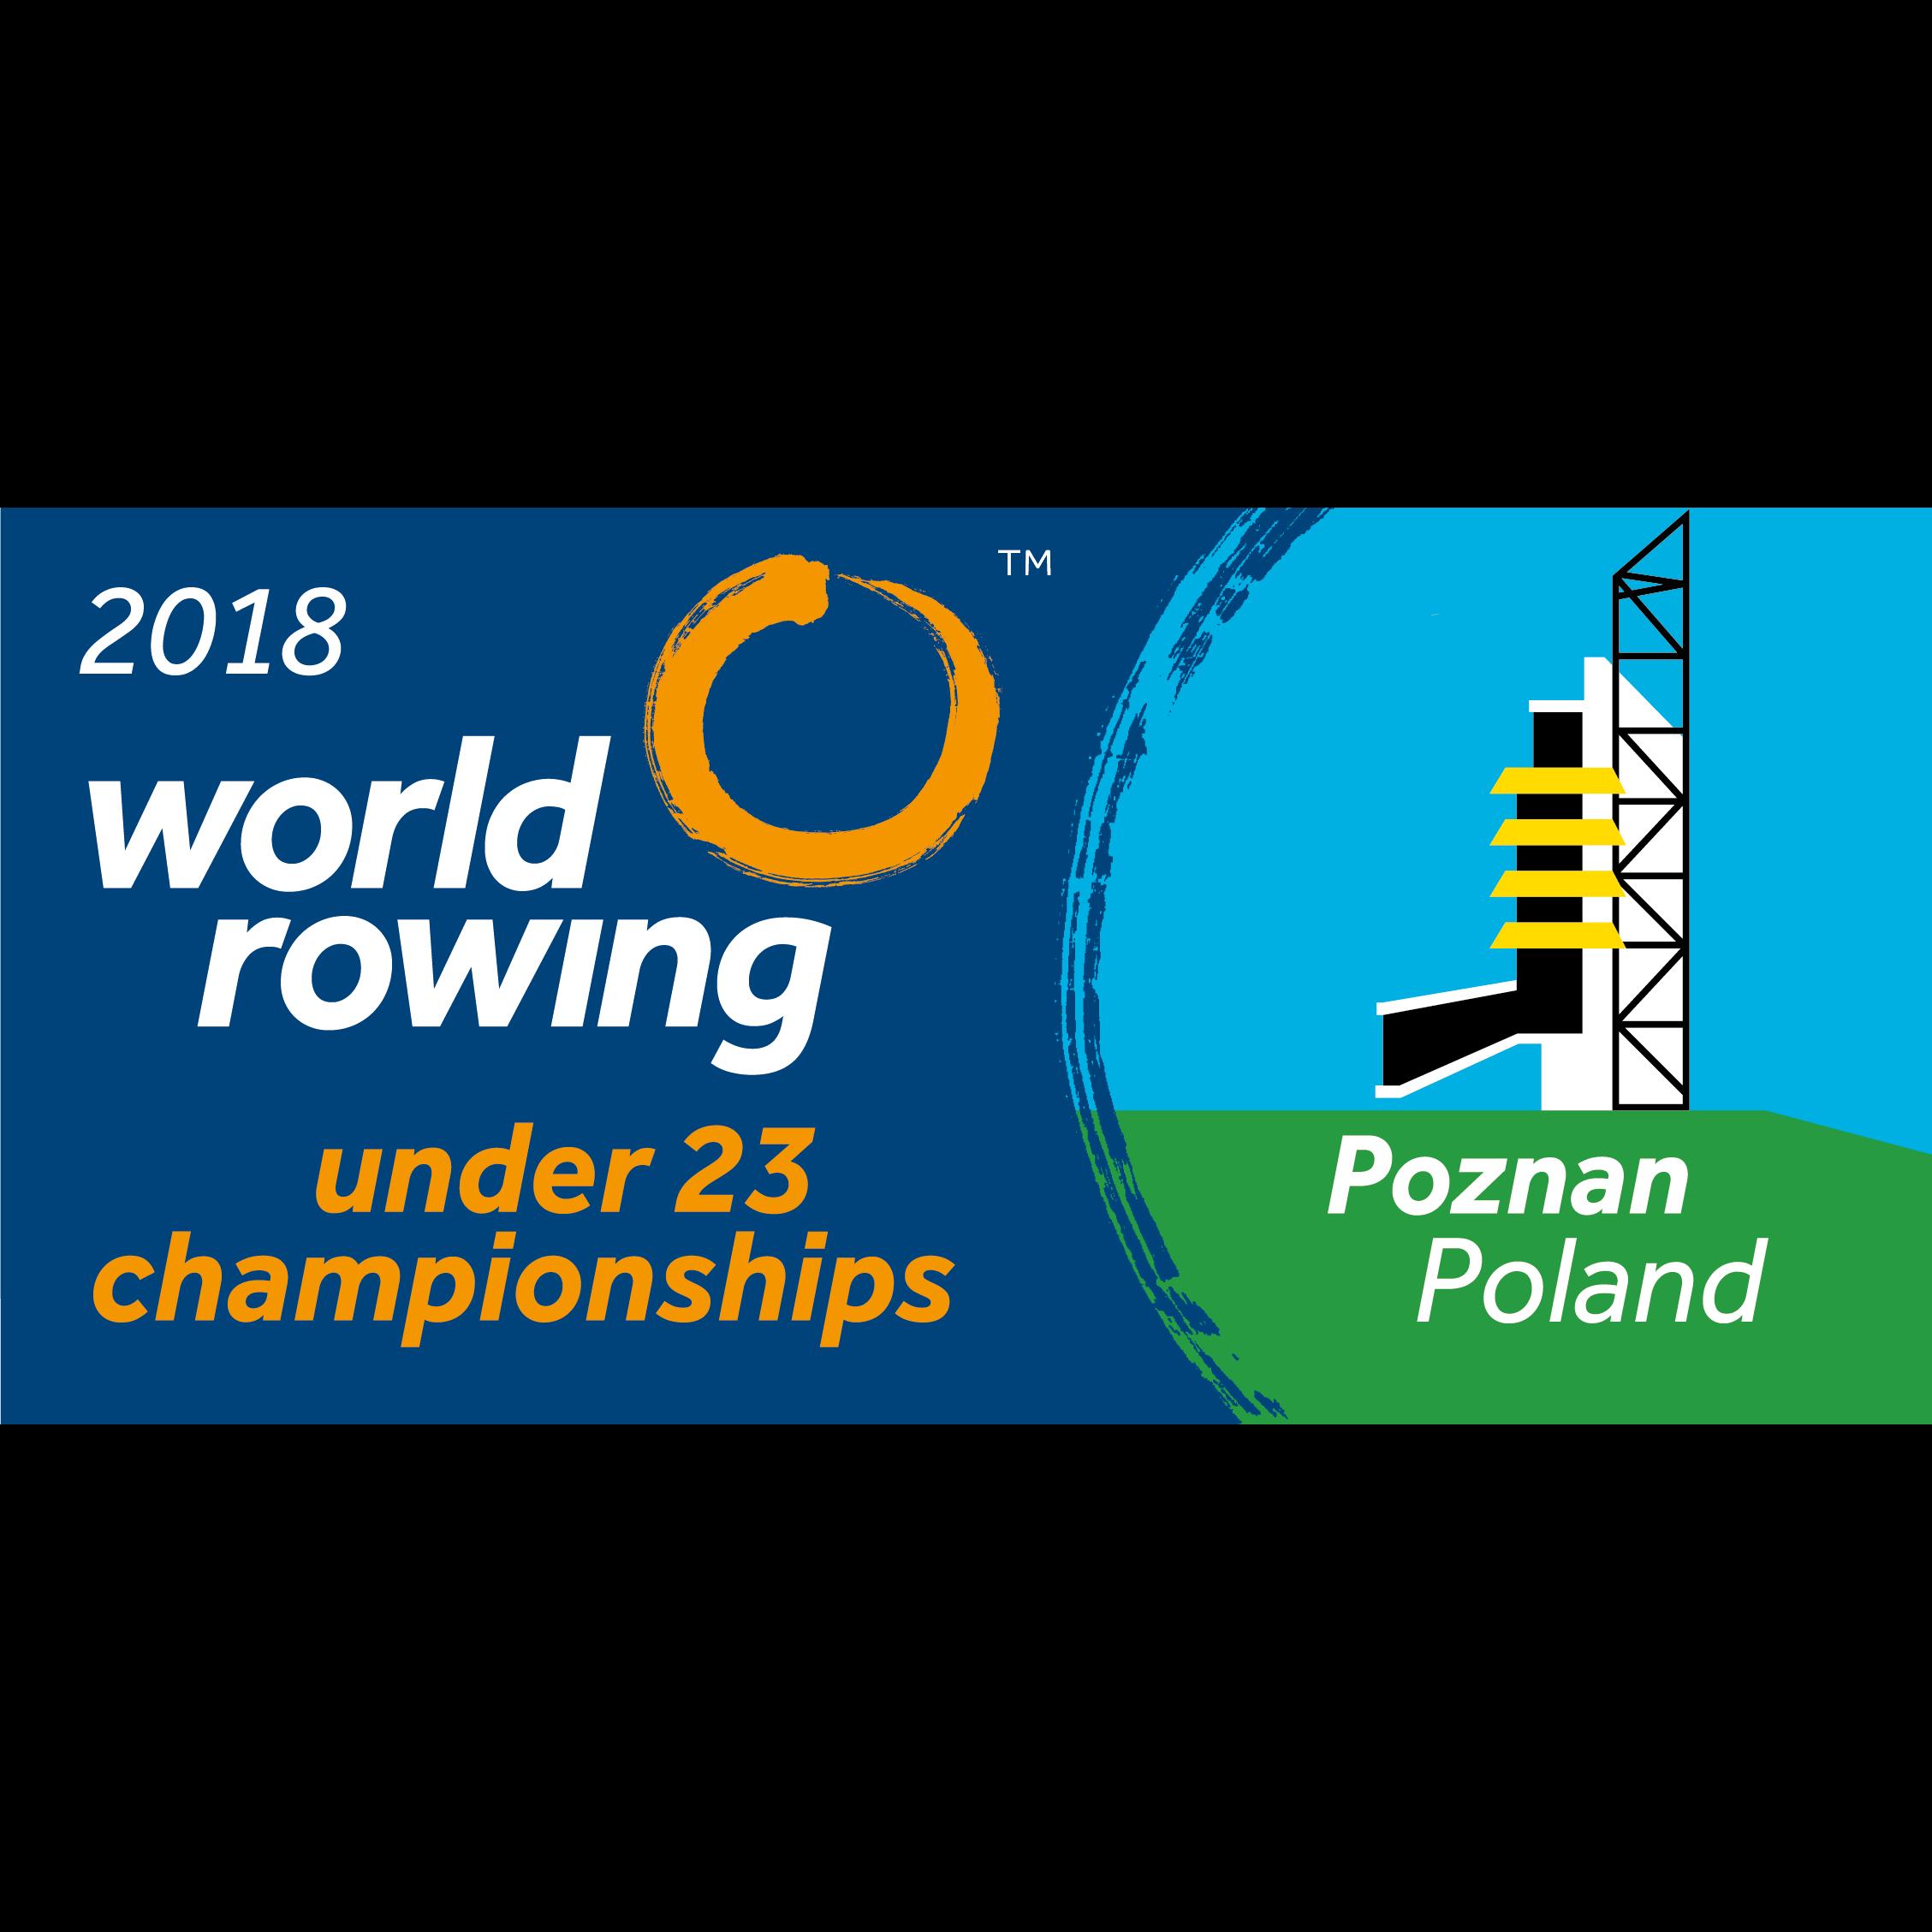 2018 World Rowing U23 Championships